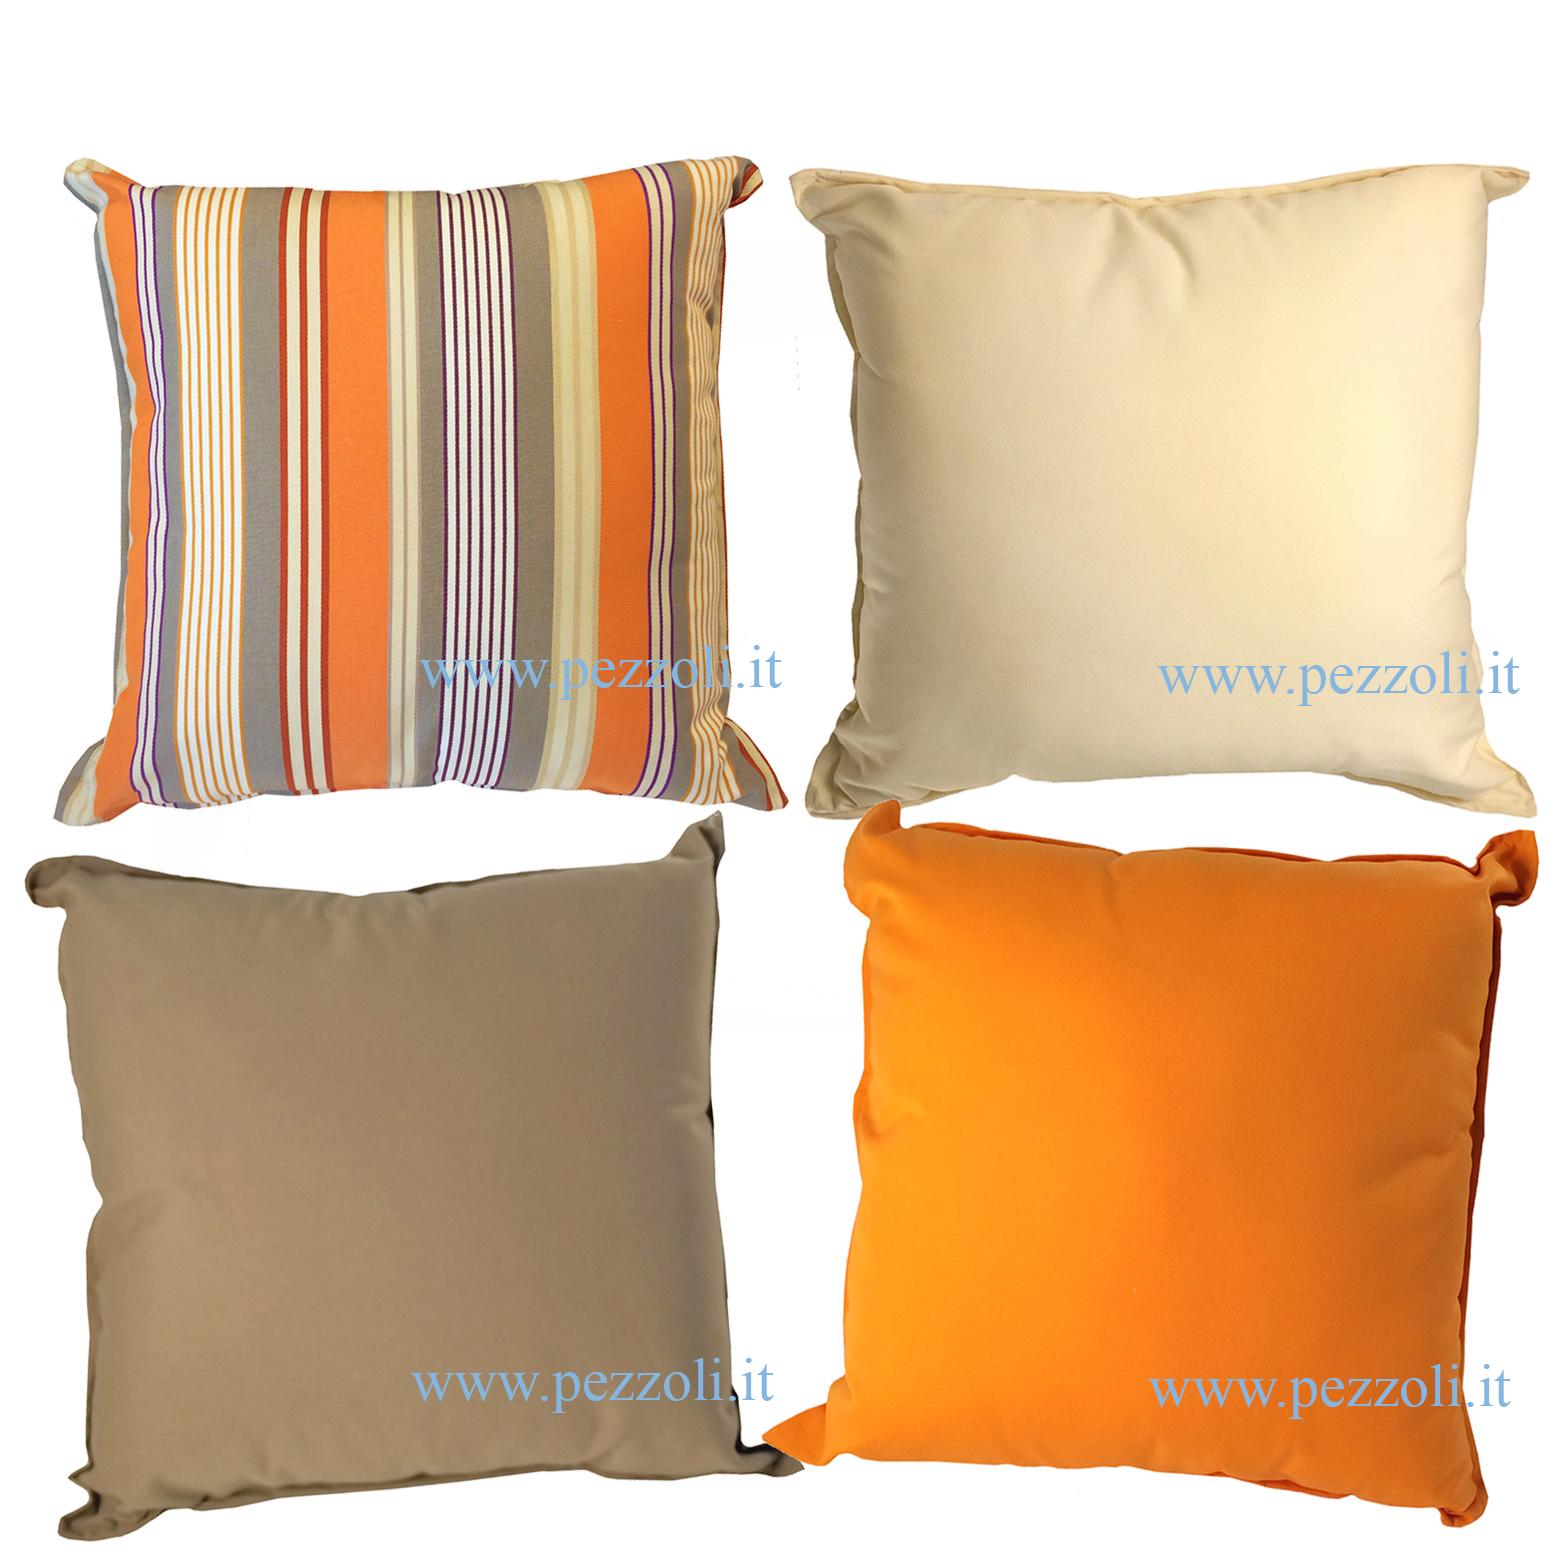 Vendita decorazioni cuscini arredo vendita online for Cuscini d arredo on line